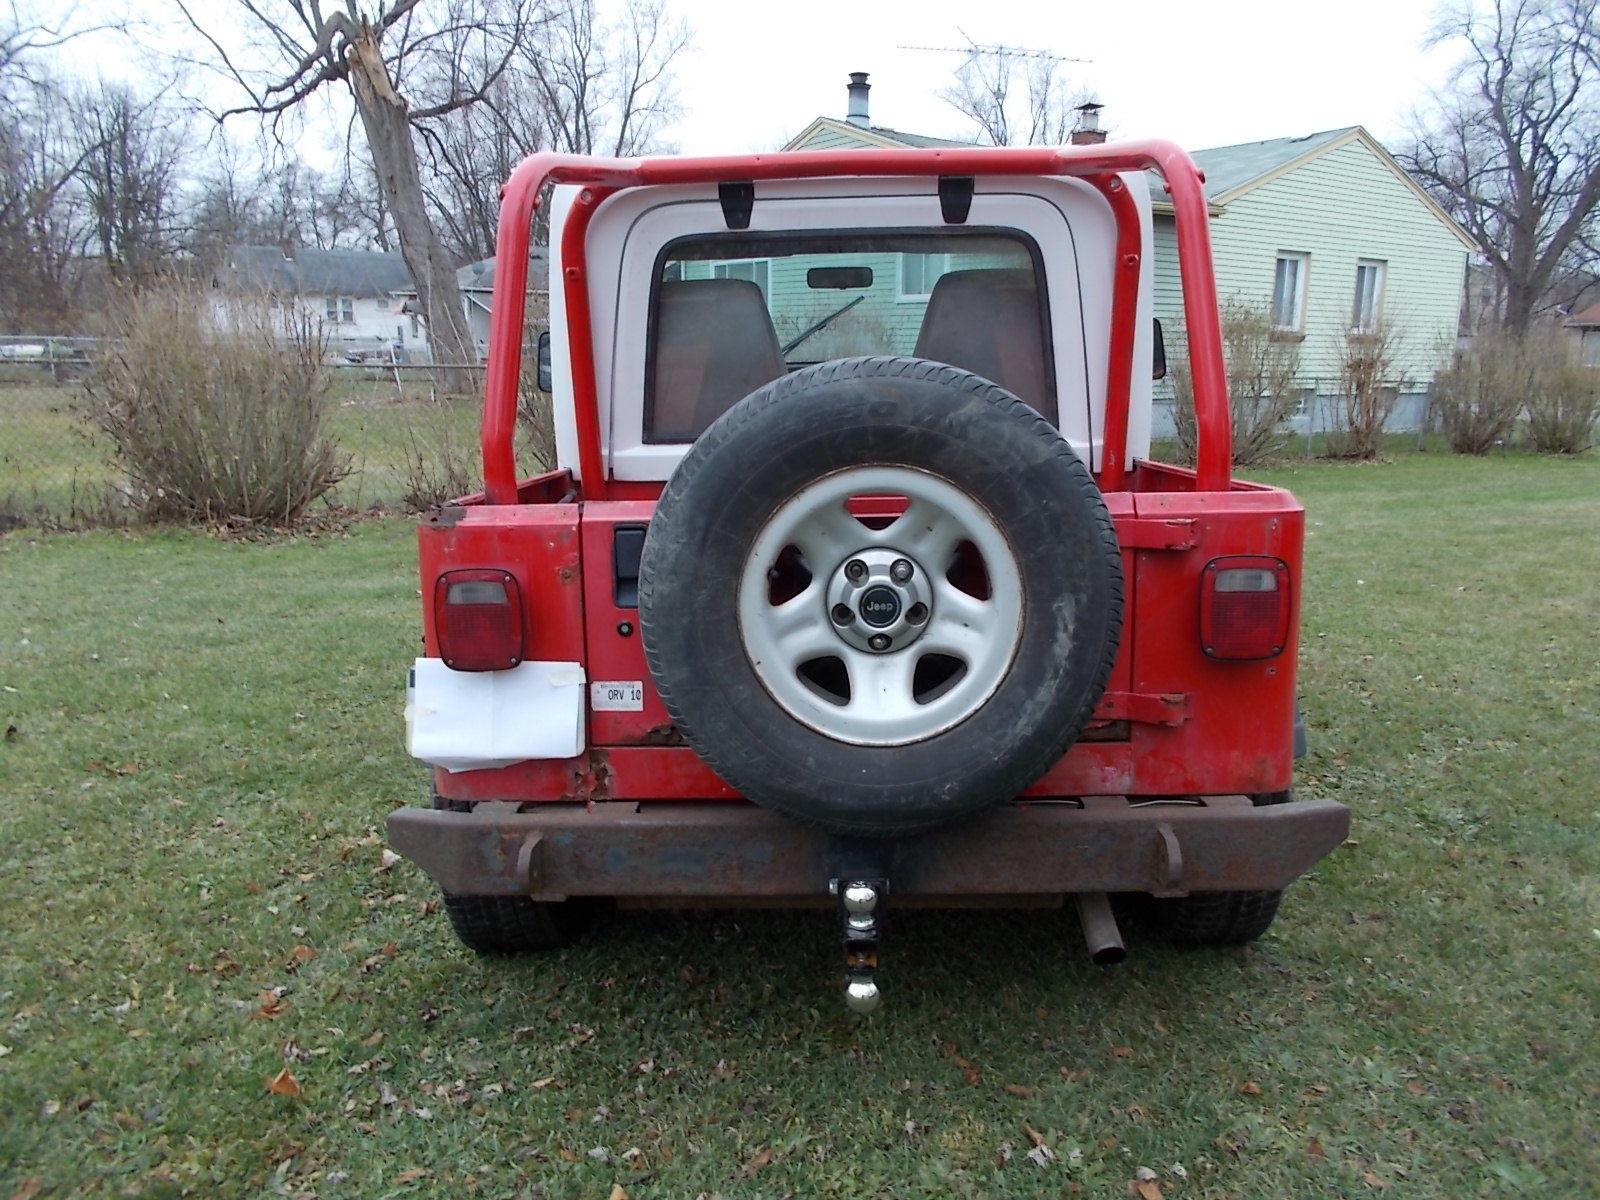 1994 Jeep Wrangler Yjhalf Hardtop25 Amc5 Speed Tranny4x4weber